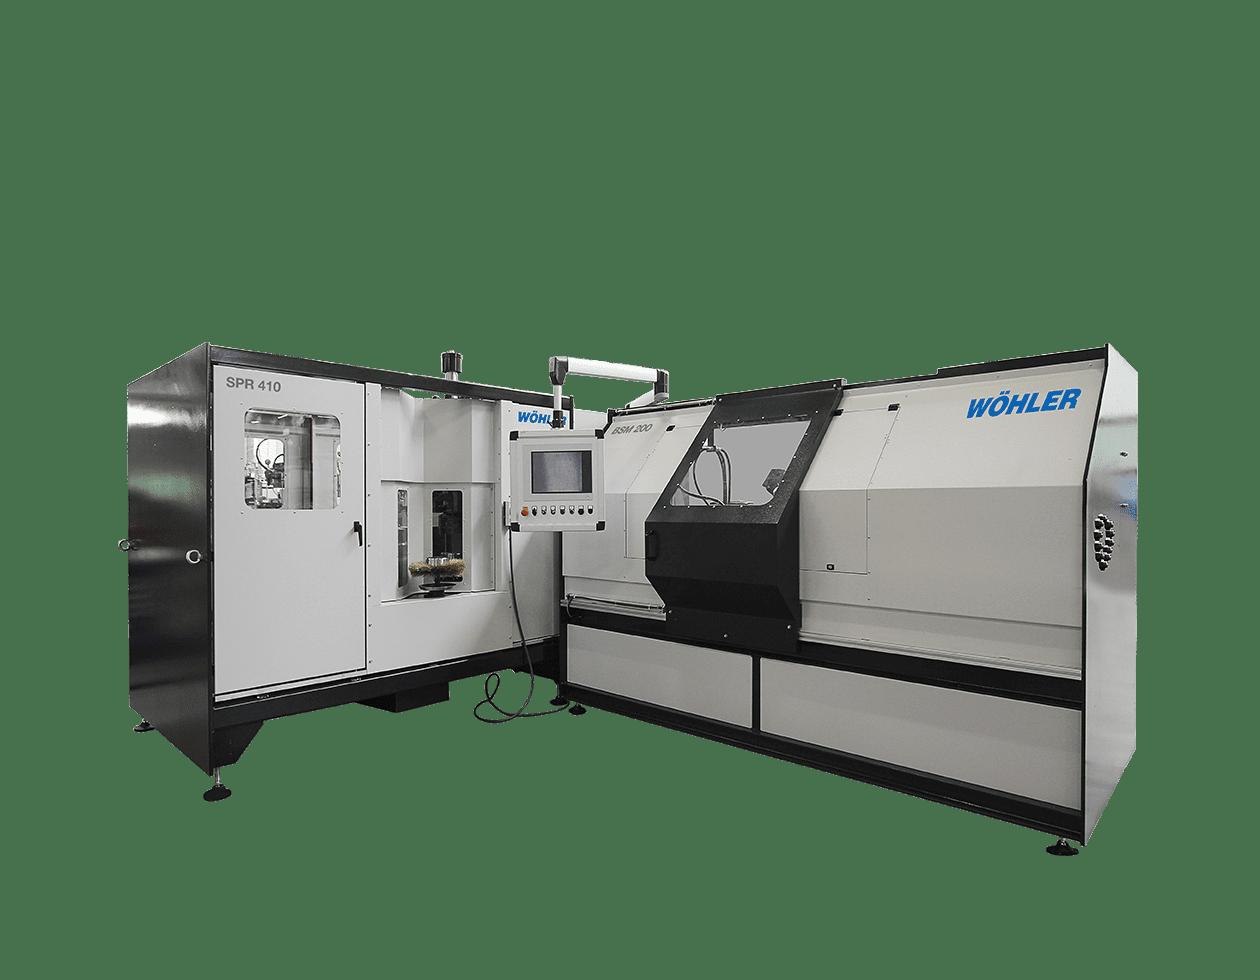 BSM 200 + SPR 300 | SPR 410